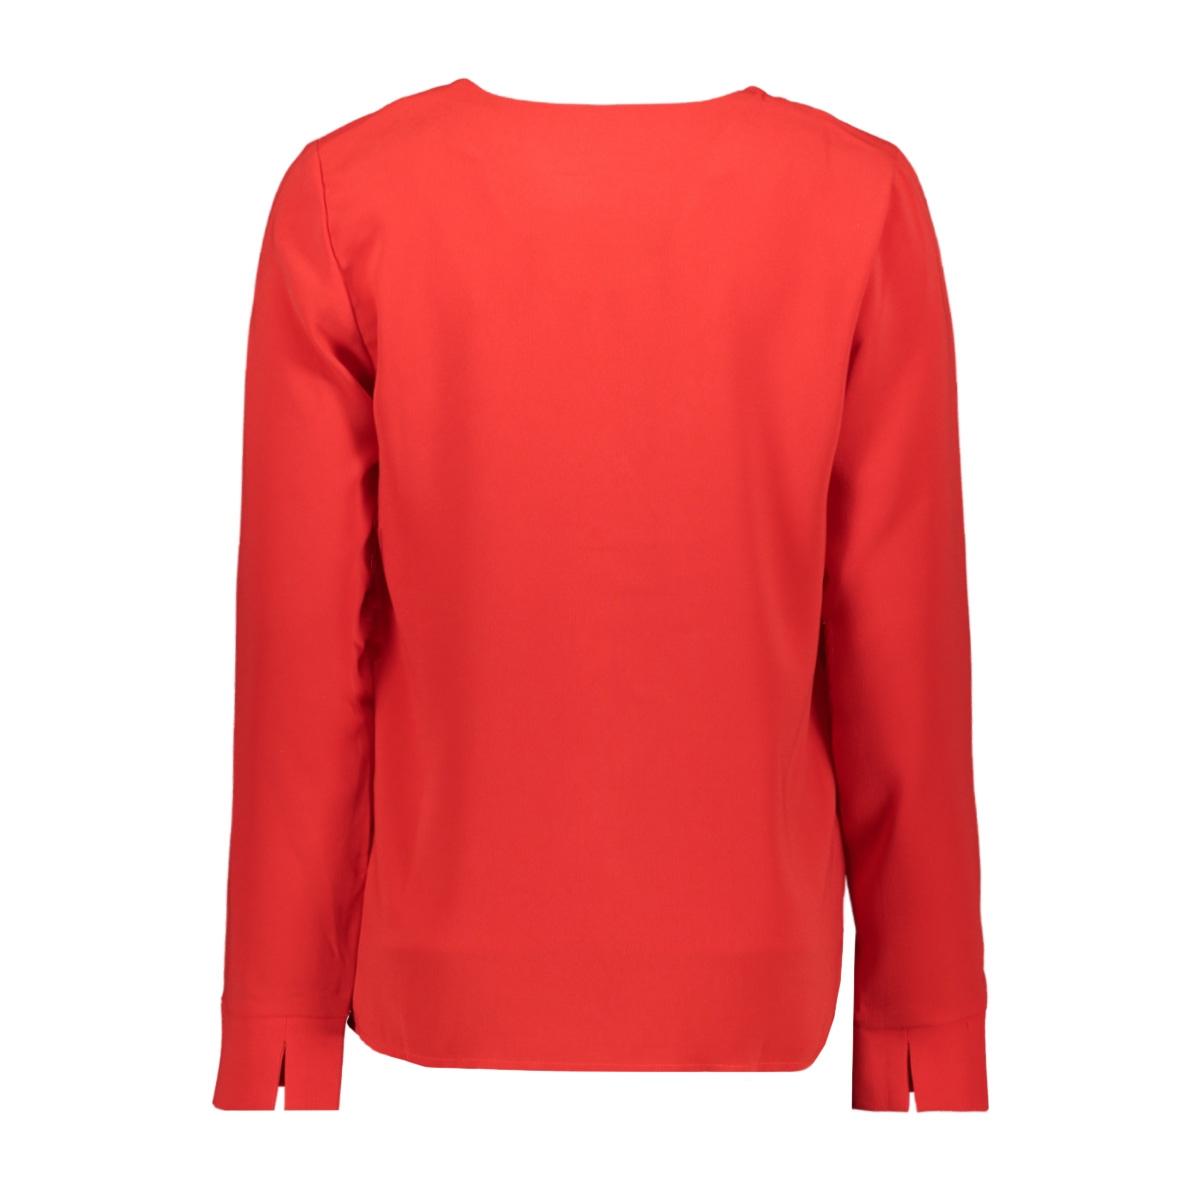 vilaia l/s v-neck top - noos 14053269 vila blouse racing red